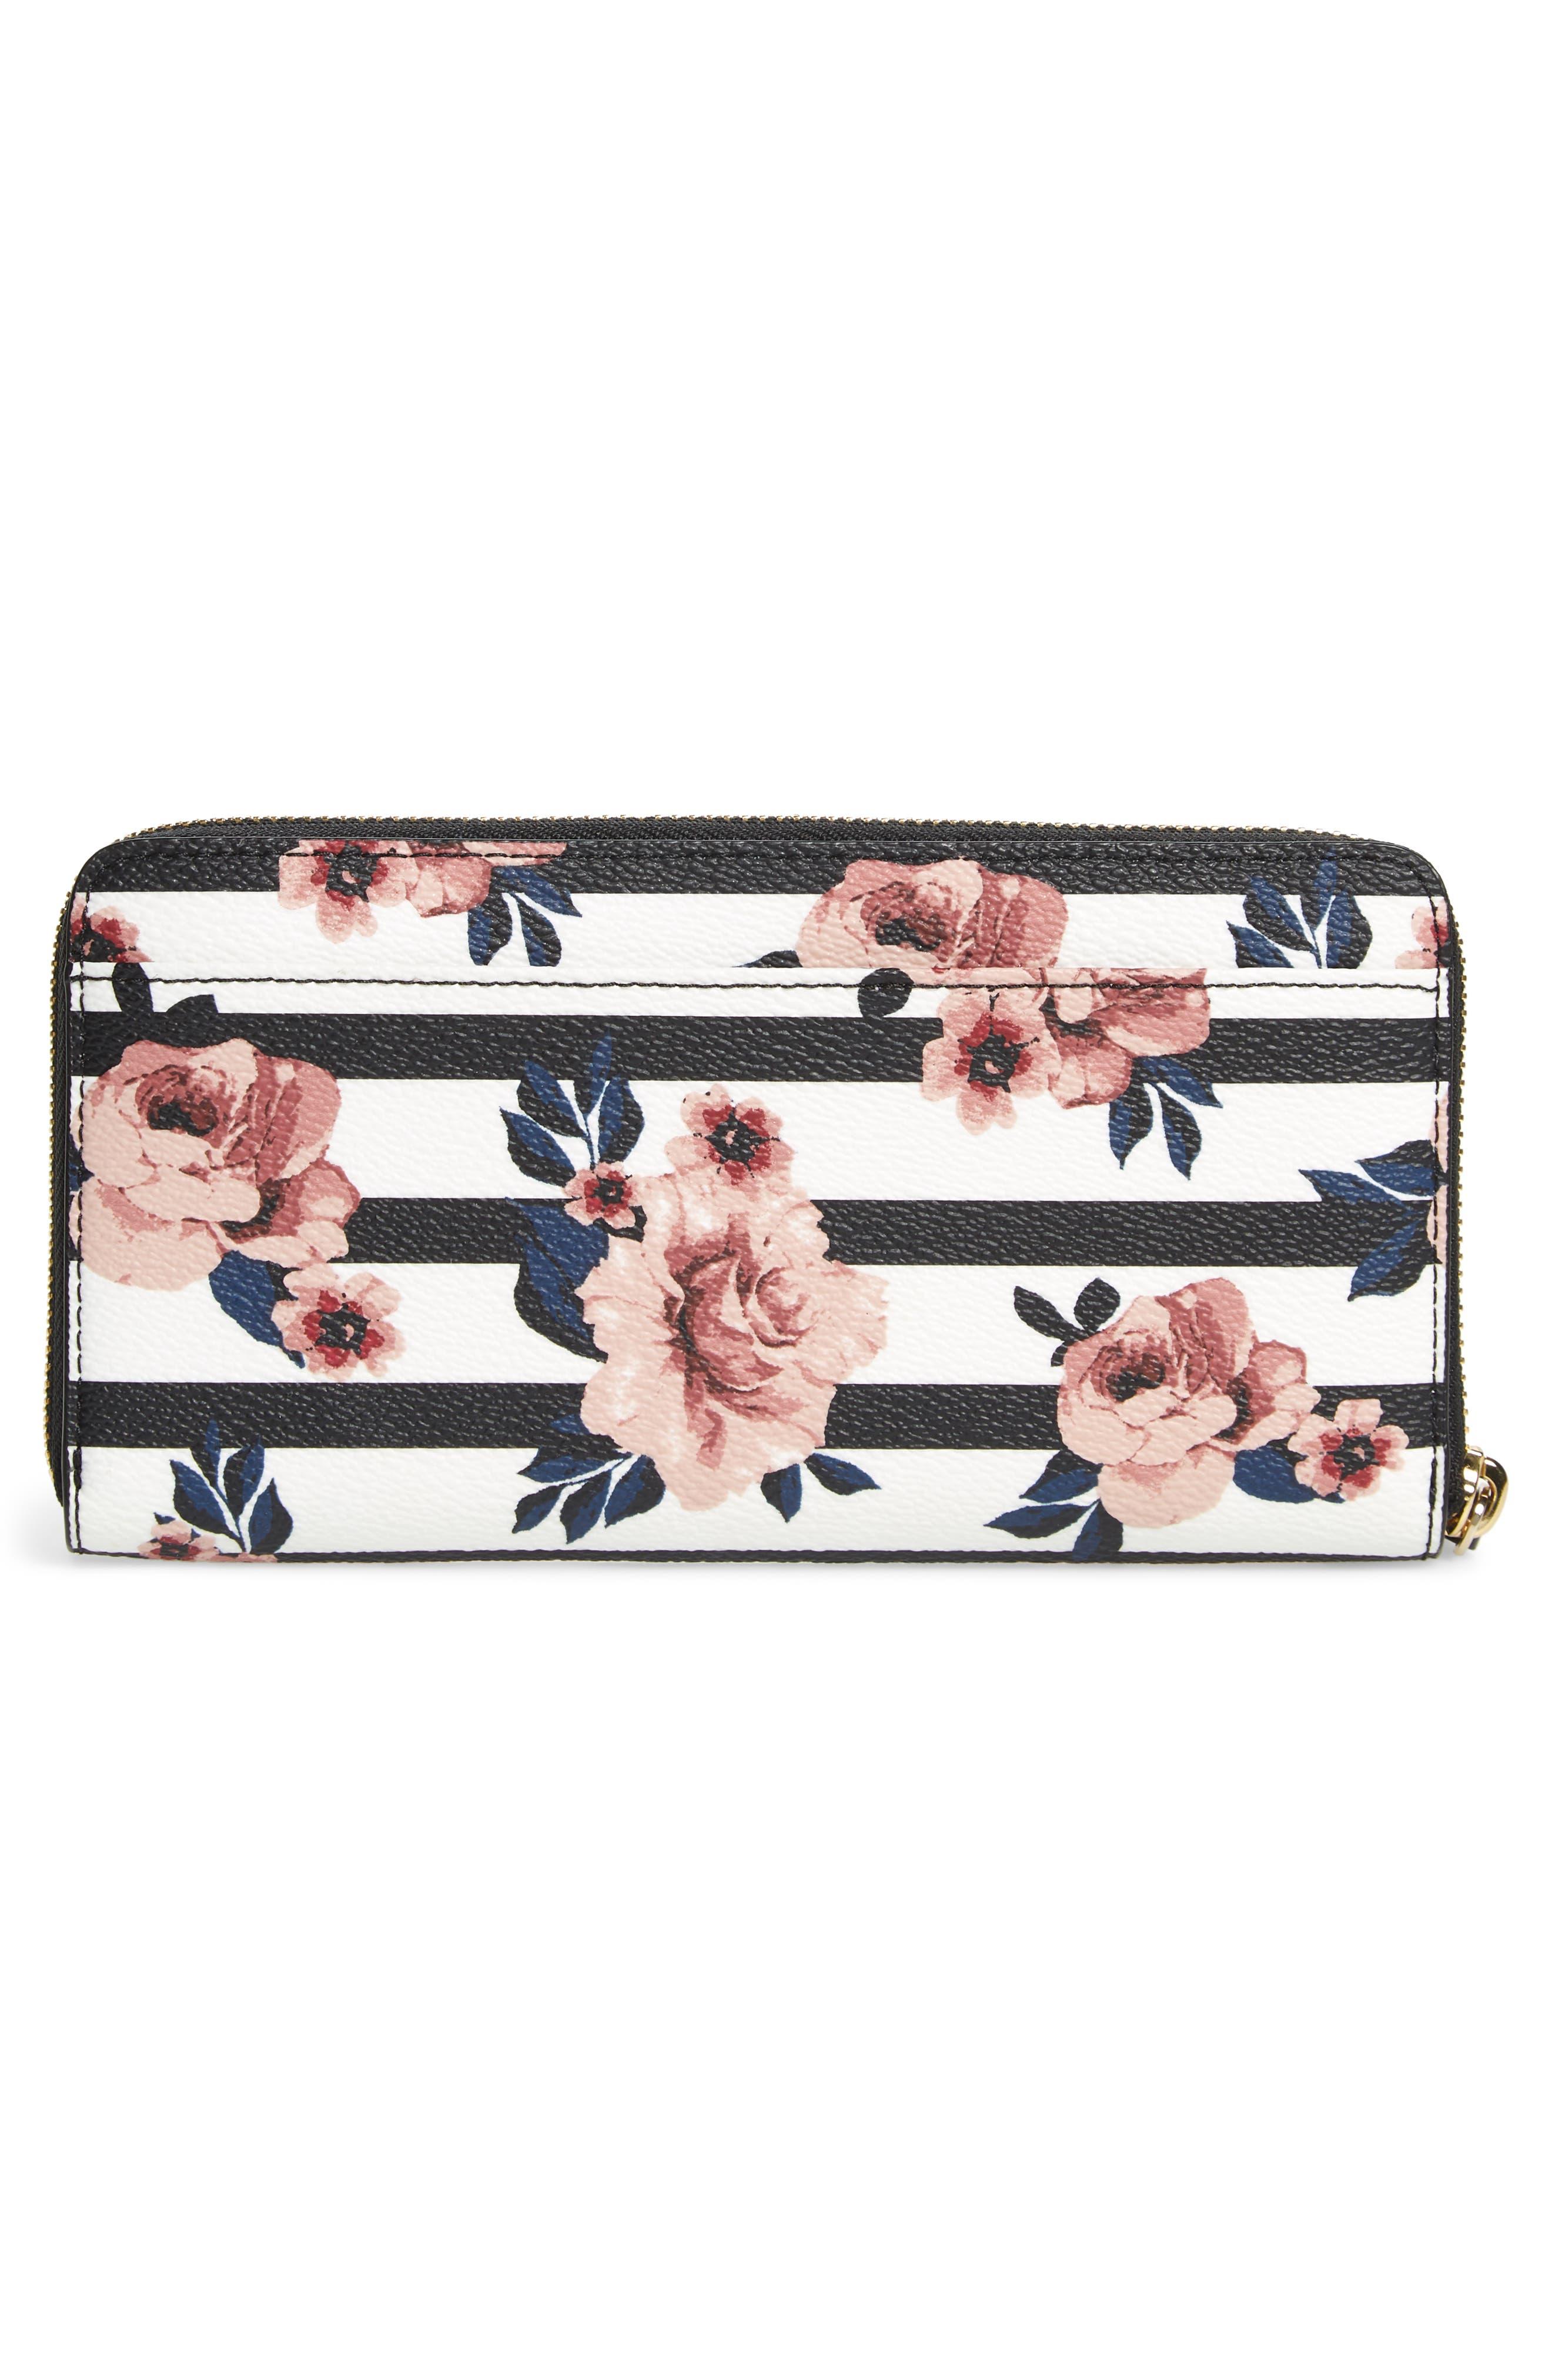 KATE SPADE NEW YORK,                             hyde lane - rose stripe lacey zip around wallet,                             Alternate thumbnail 3, color,                             001